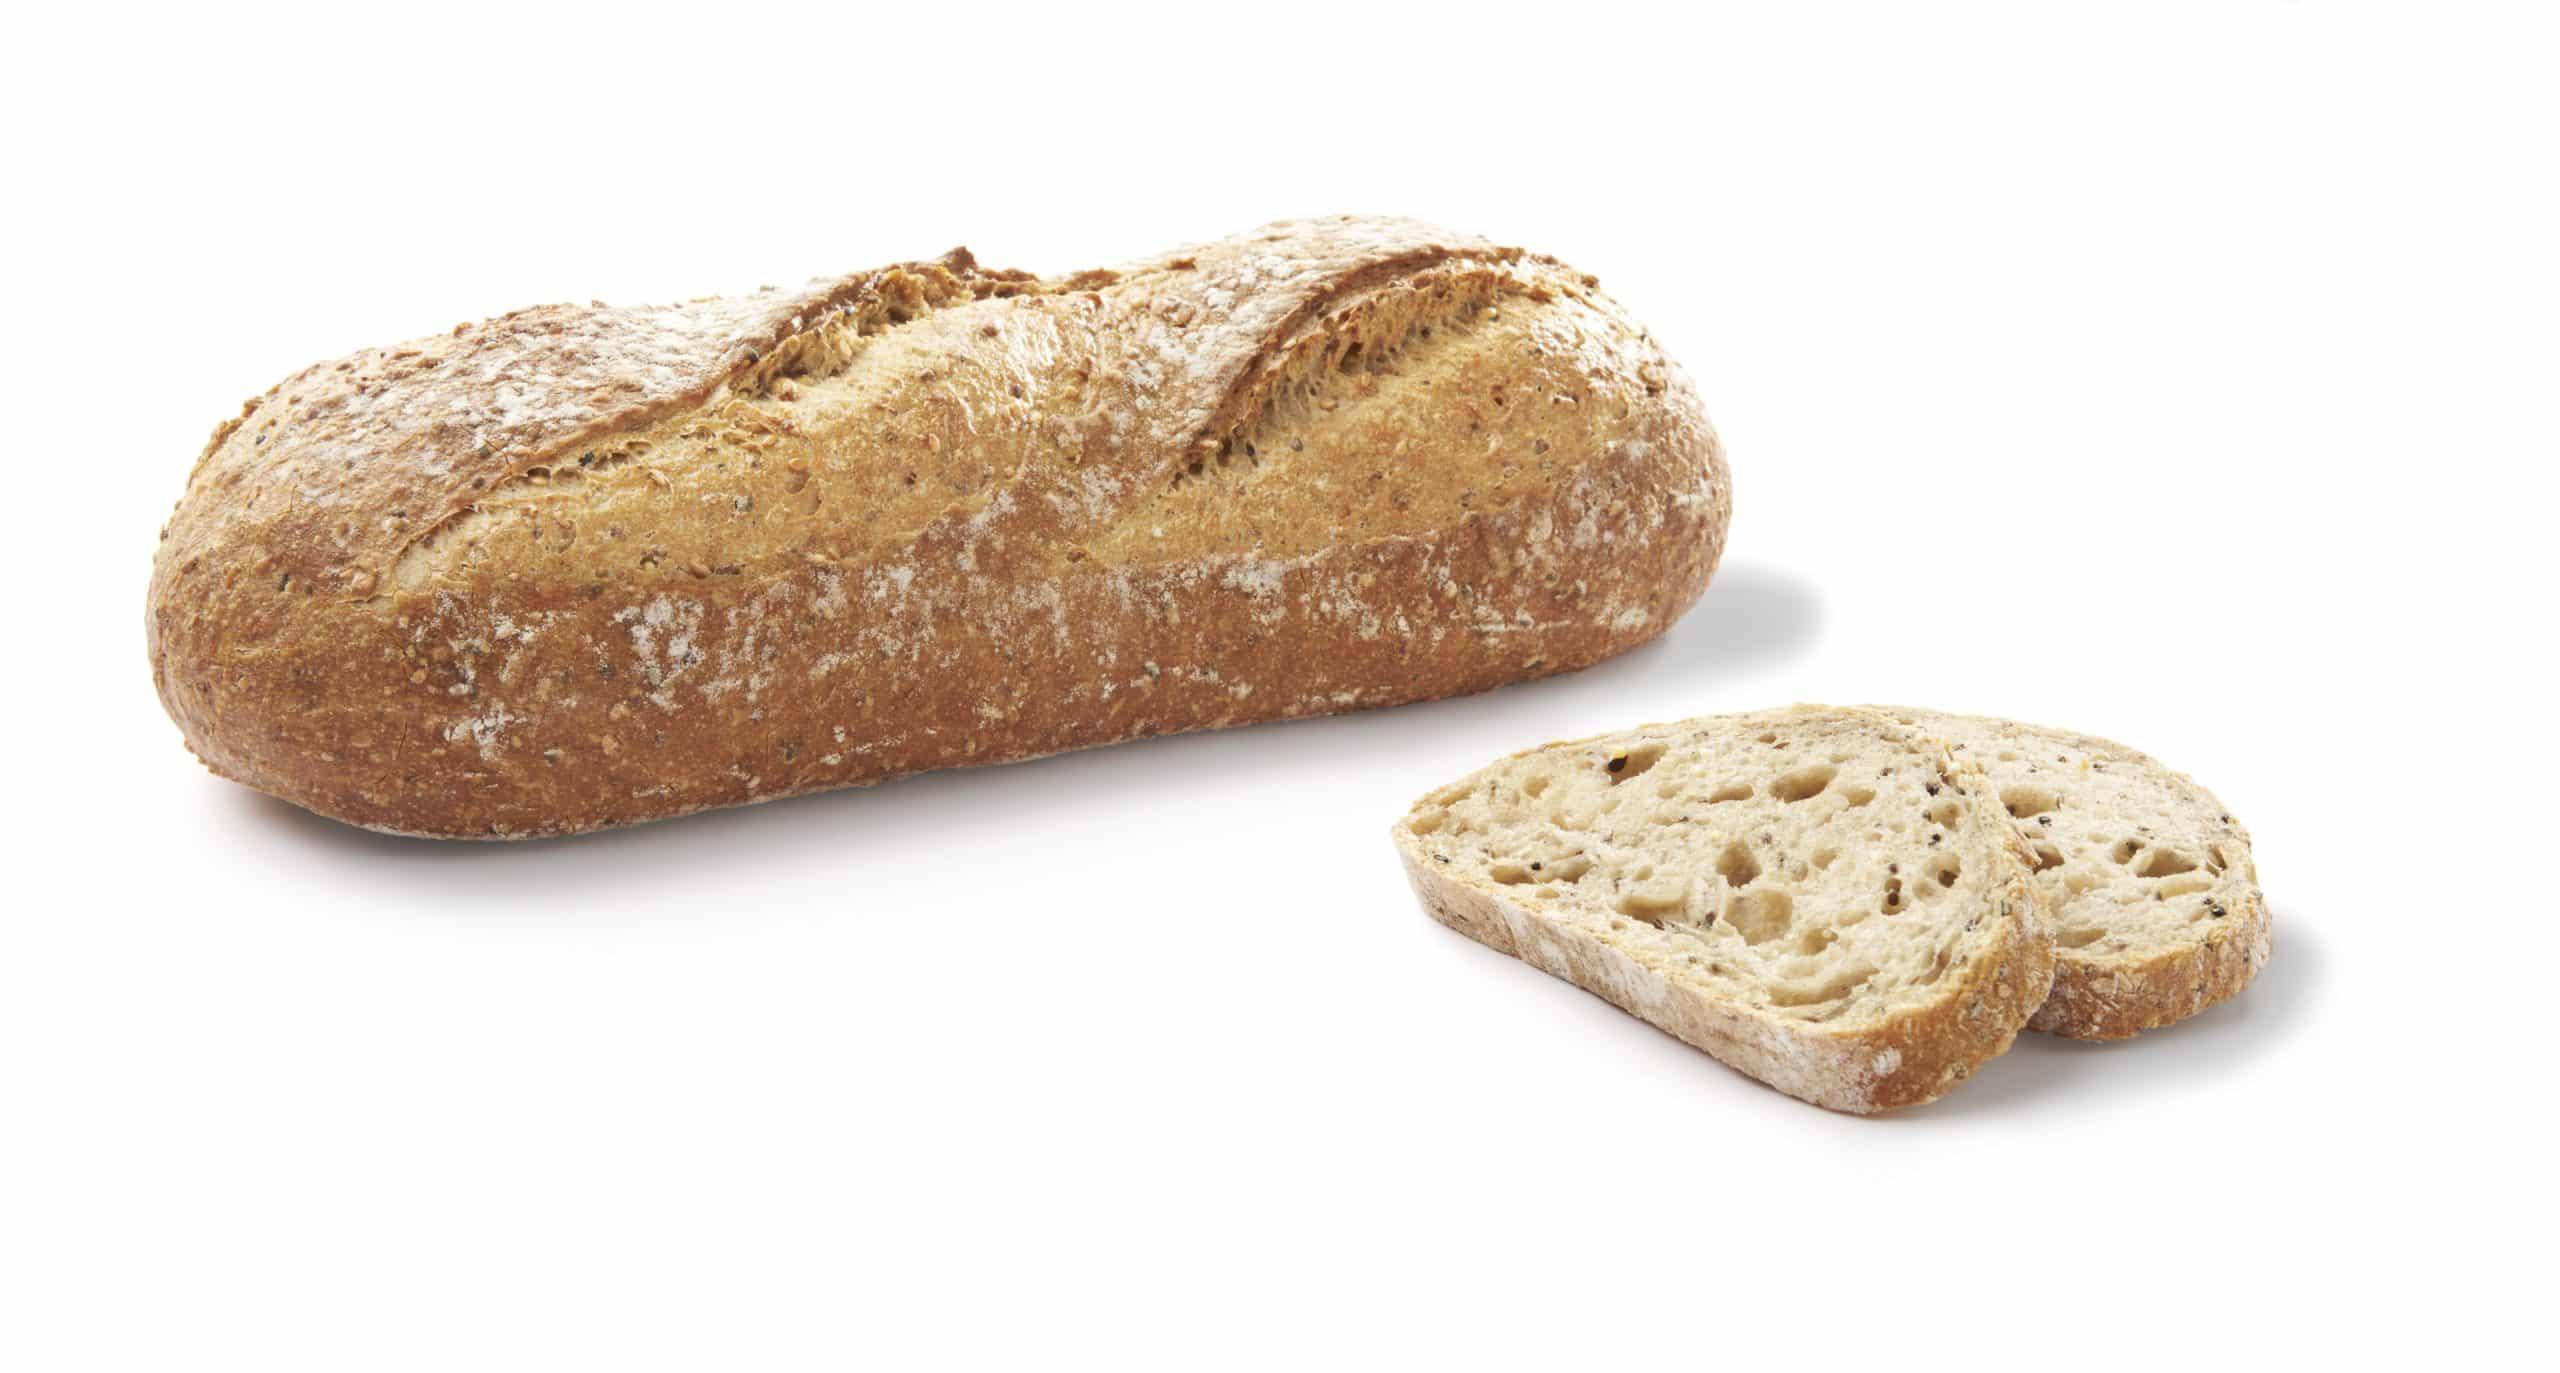 Pain-Cereales-Graines-400g-Les-Gourmets